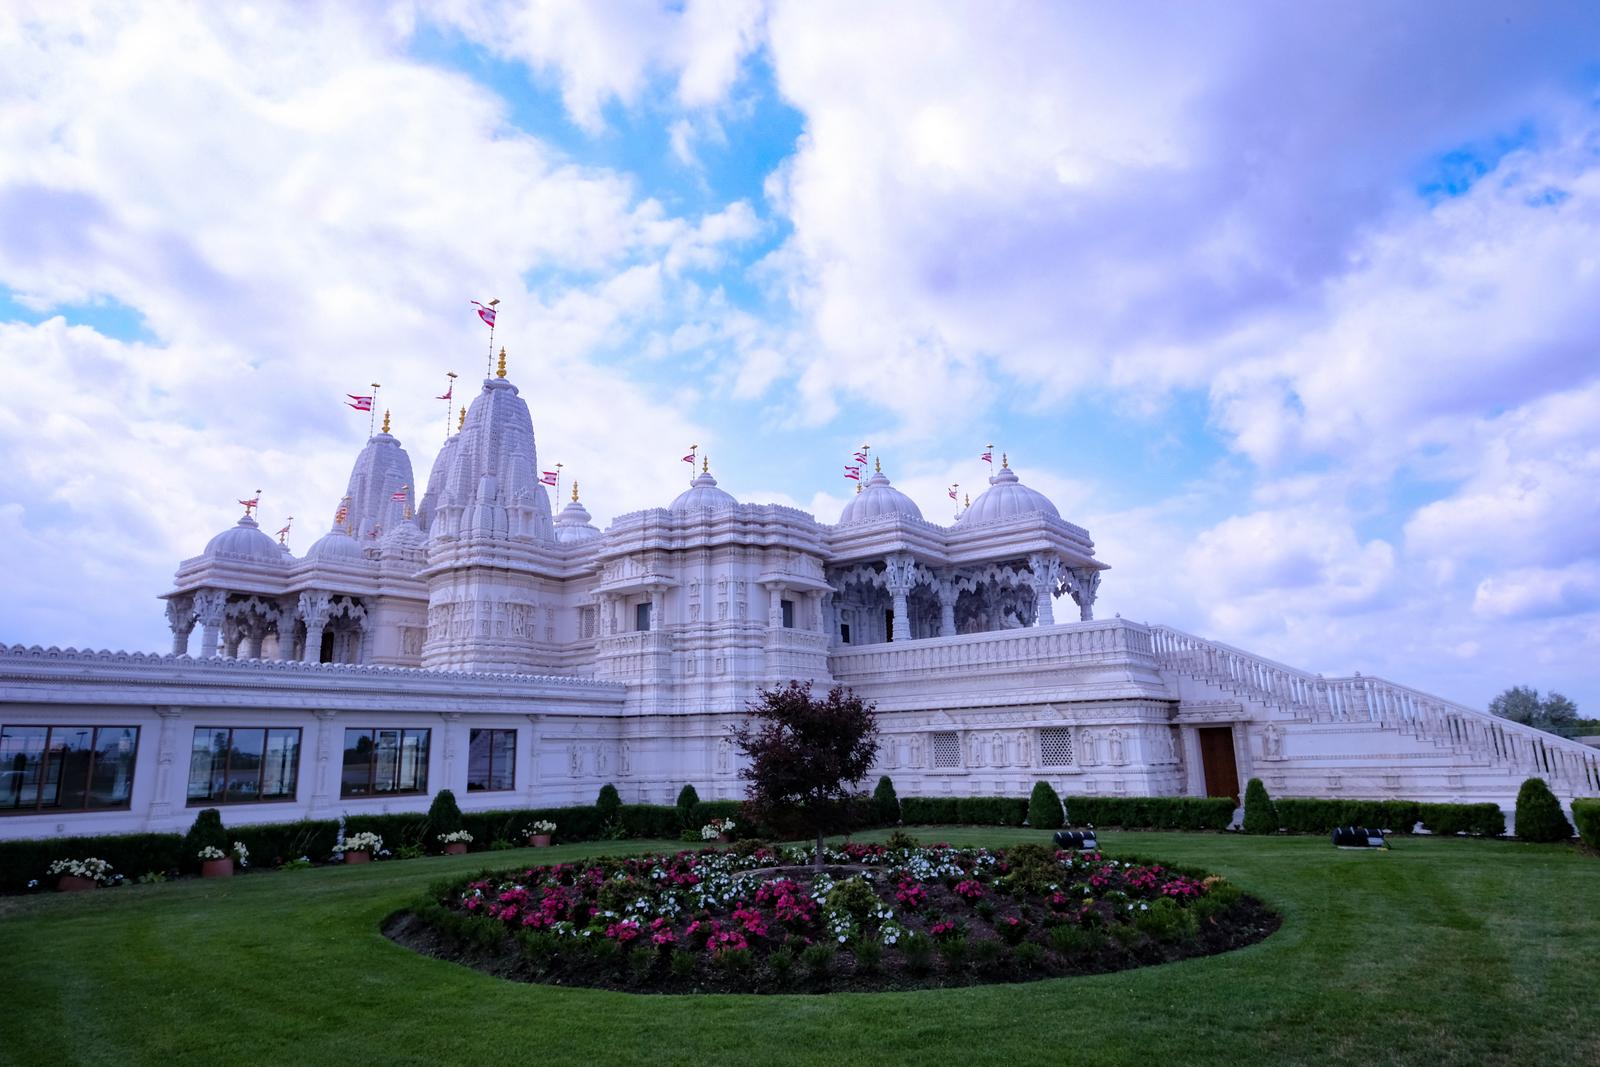 The BAPS Shri Swaminarayan  Mandir in northwest Toronto has a truly inspiring interior. - JIM BYERS PHOTO